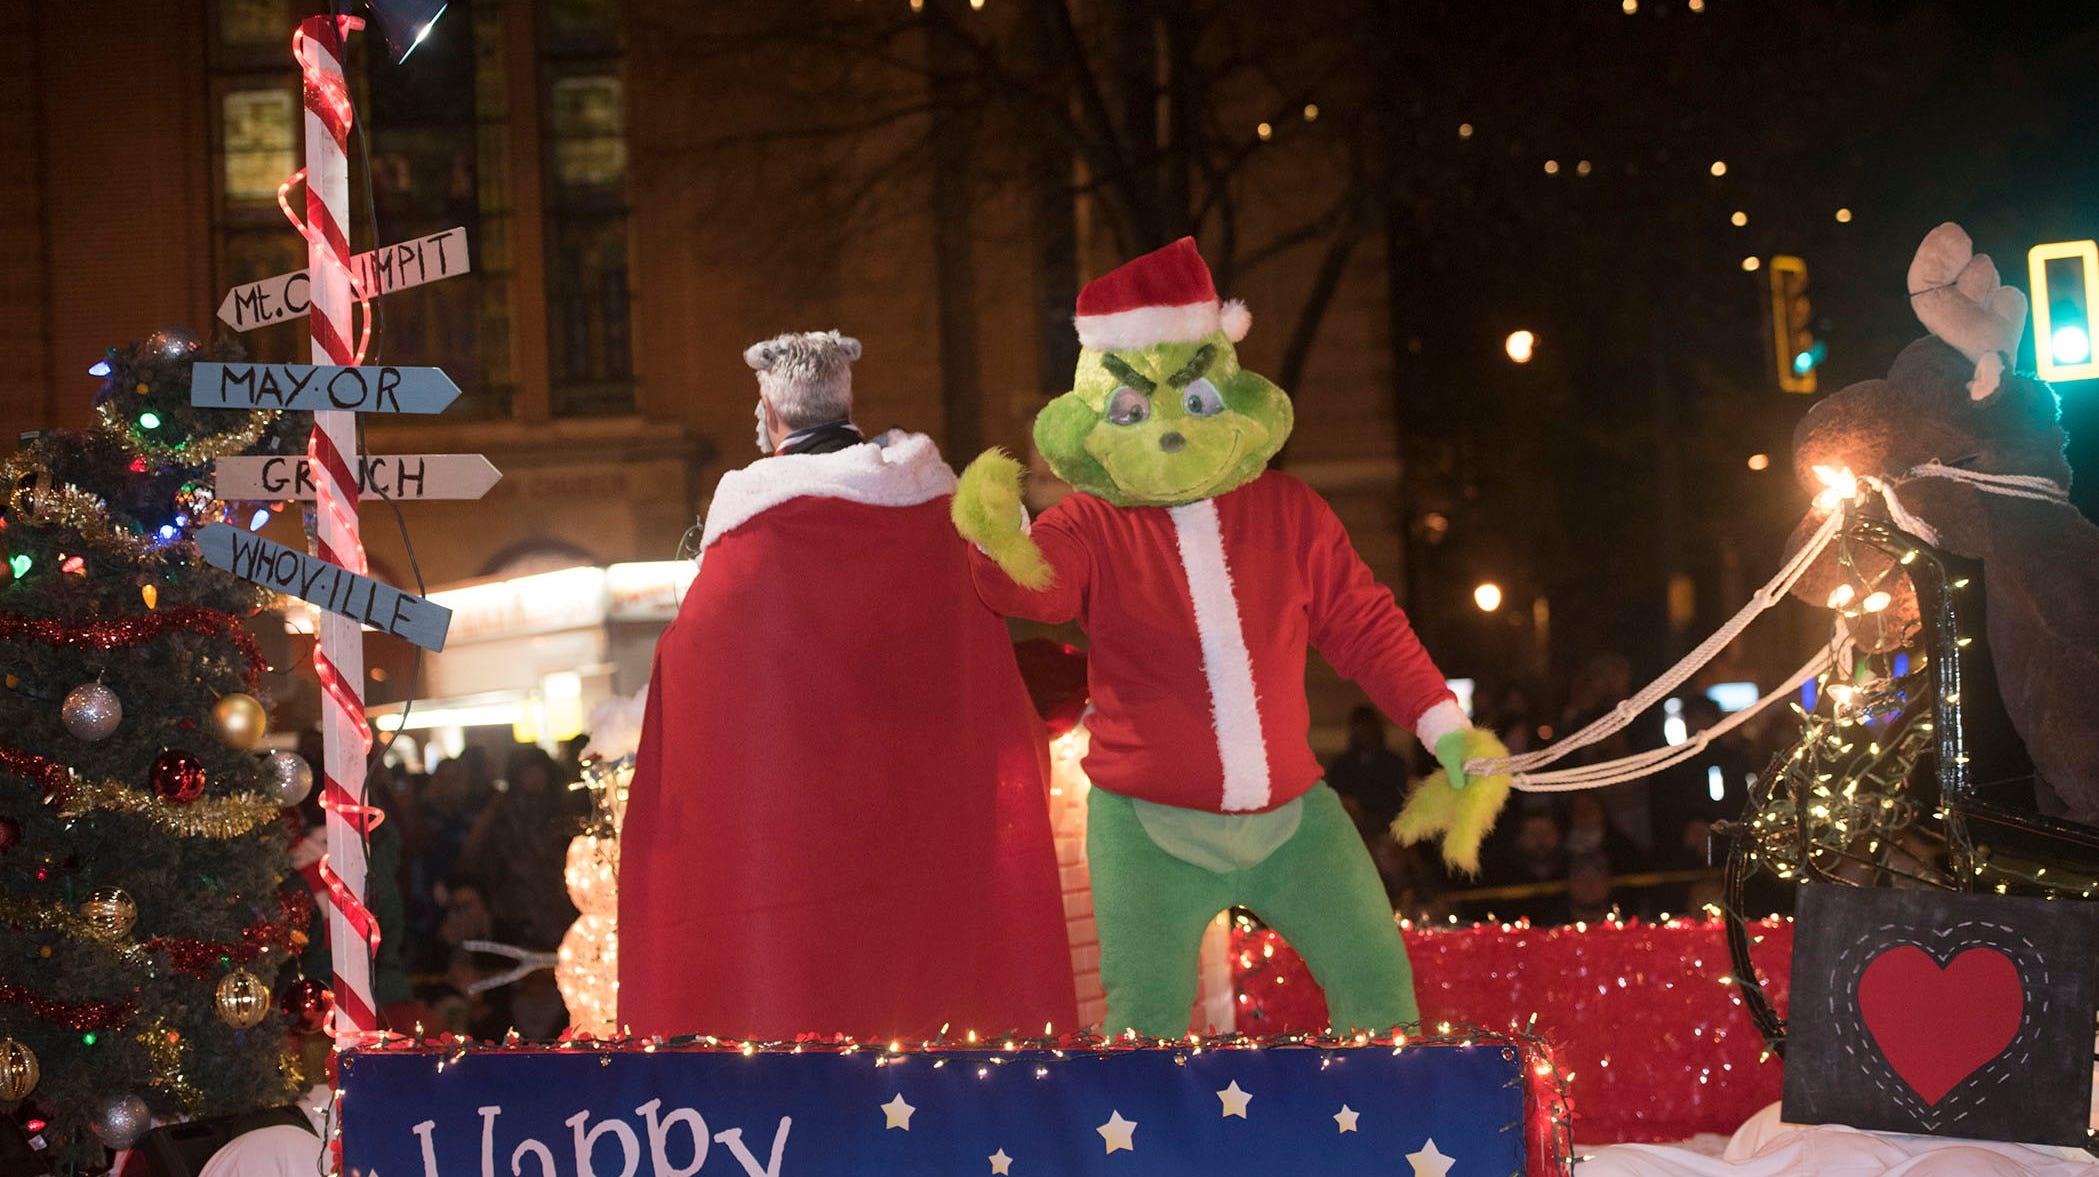 Waynesboro Christmas Parade 2021 Christmas Parades Covid 19 Changes Franklin County Holiday Events